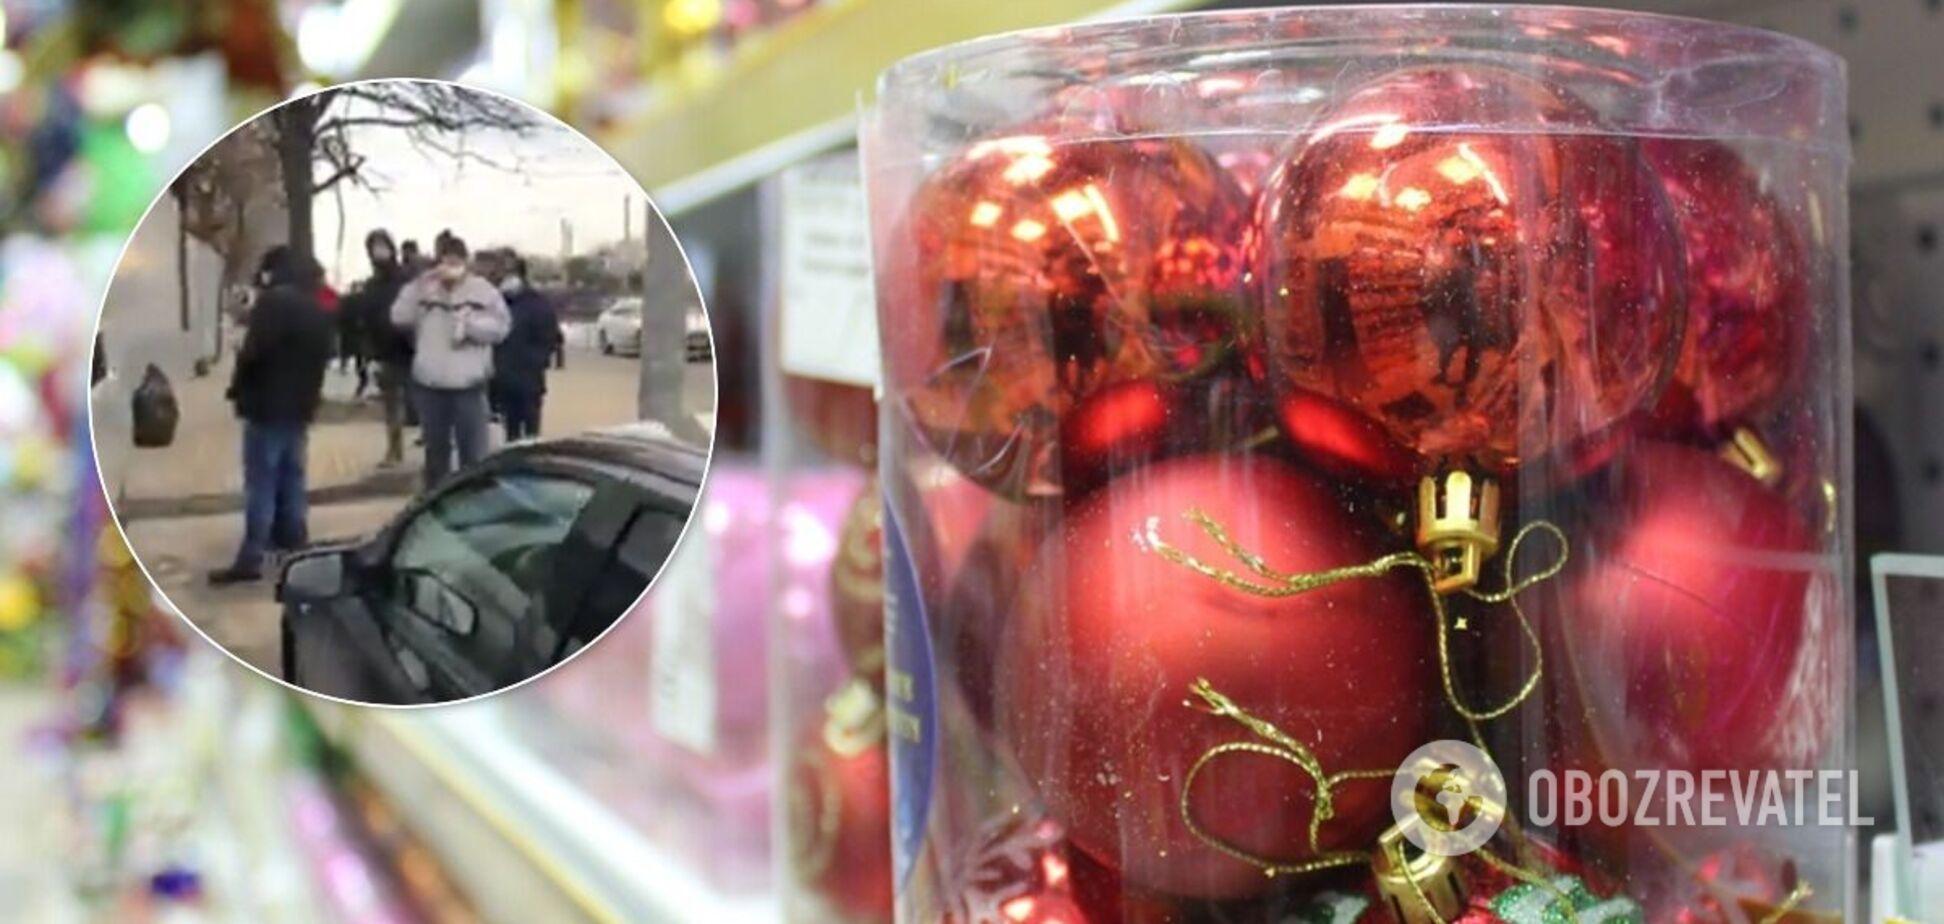 Ажиотаж в супермаркетах перед Новым годом